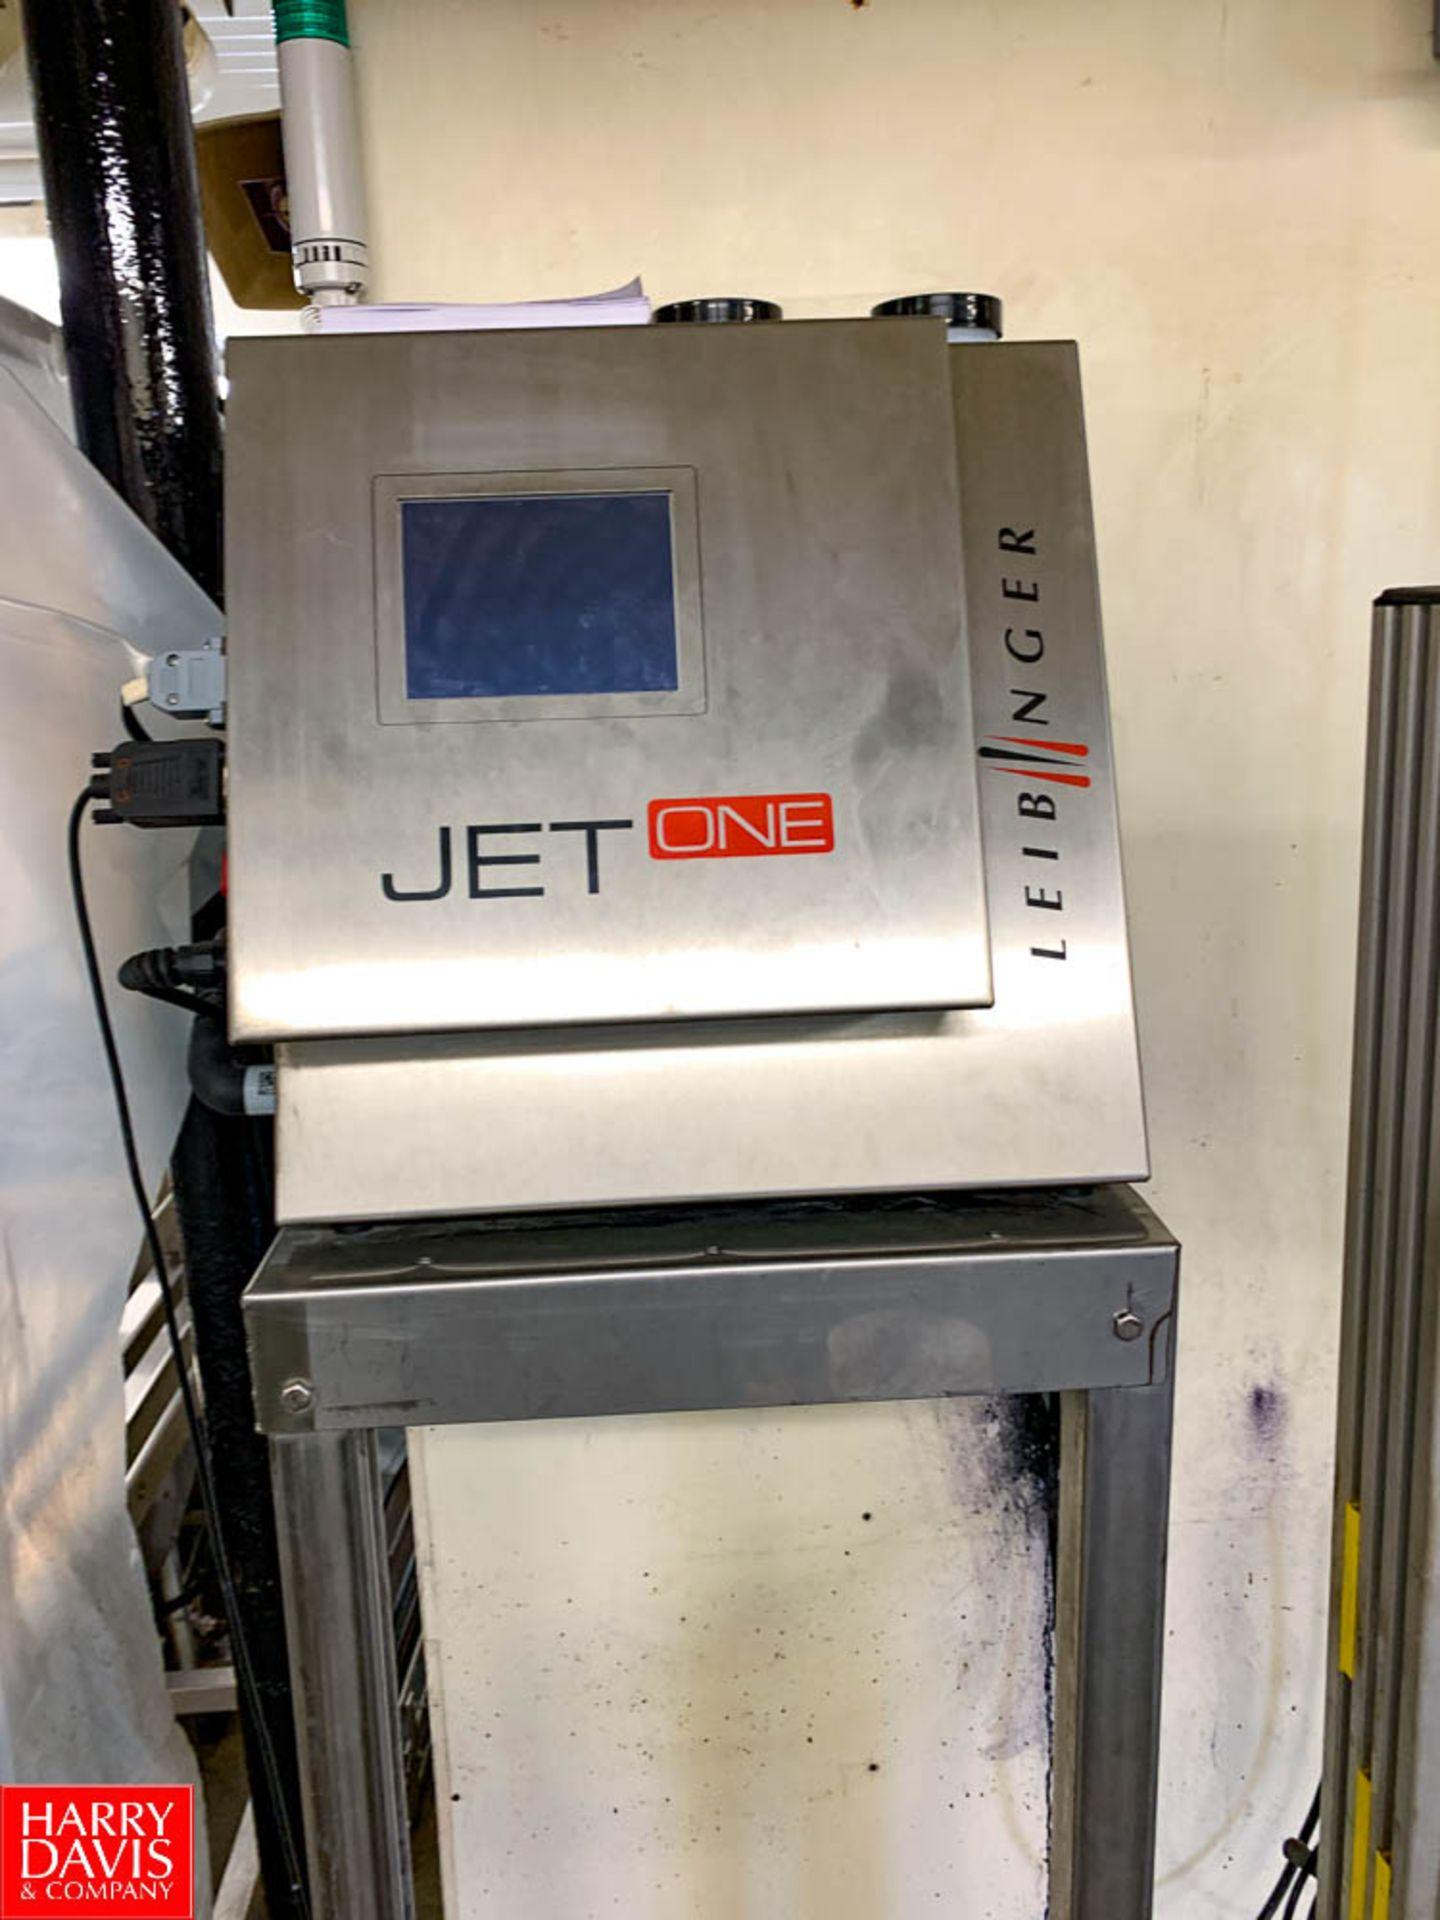 2018 Leibinger Ink Jet Coder Type Jet One, S/N: 98-0170009